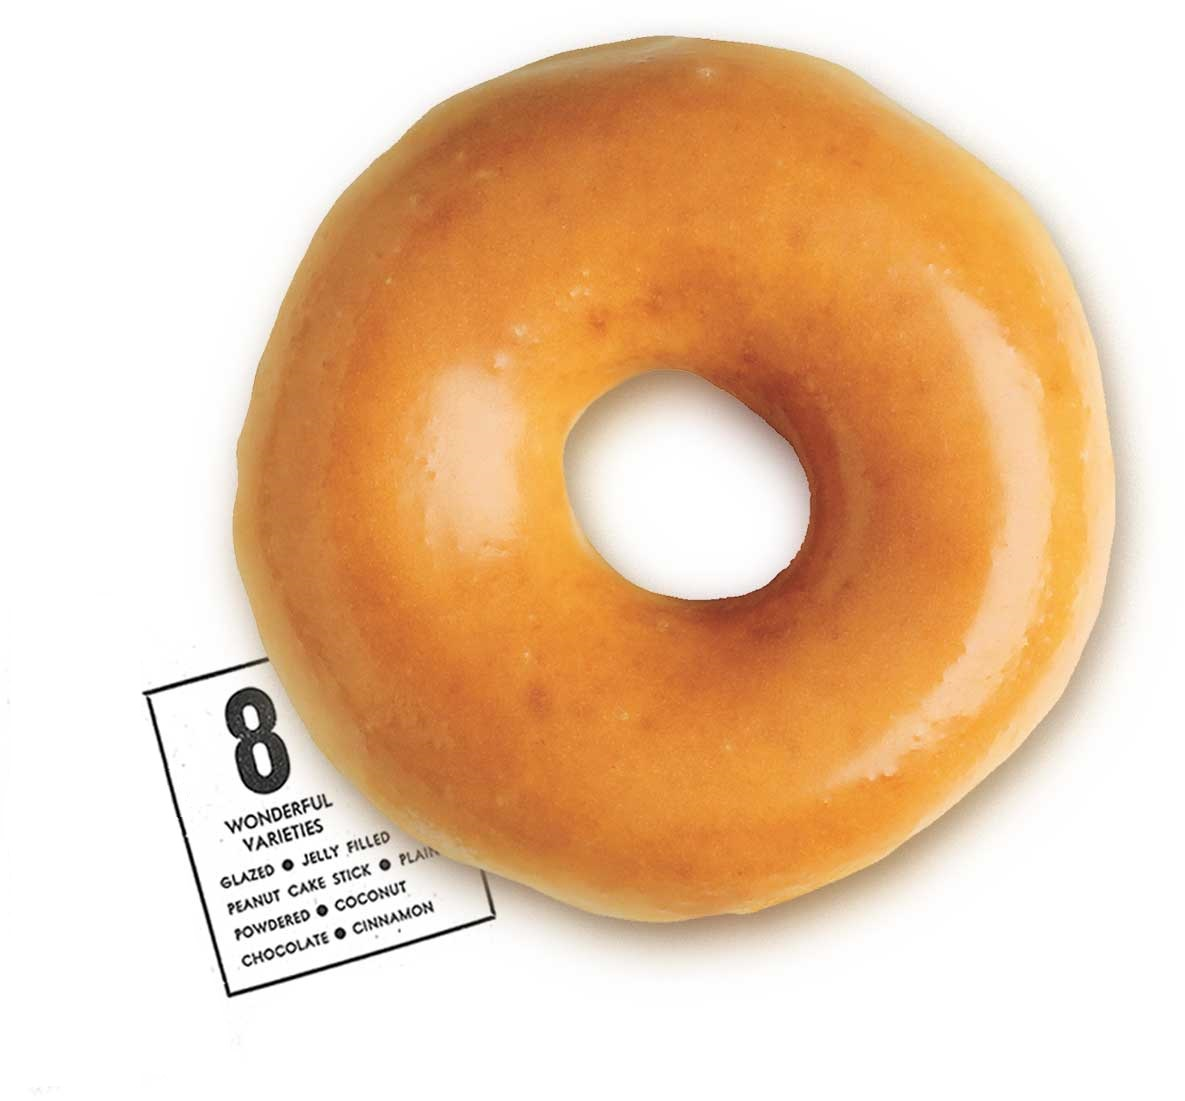 HQ Doughnut Wallpapers | File 108.7Kb